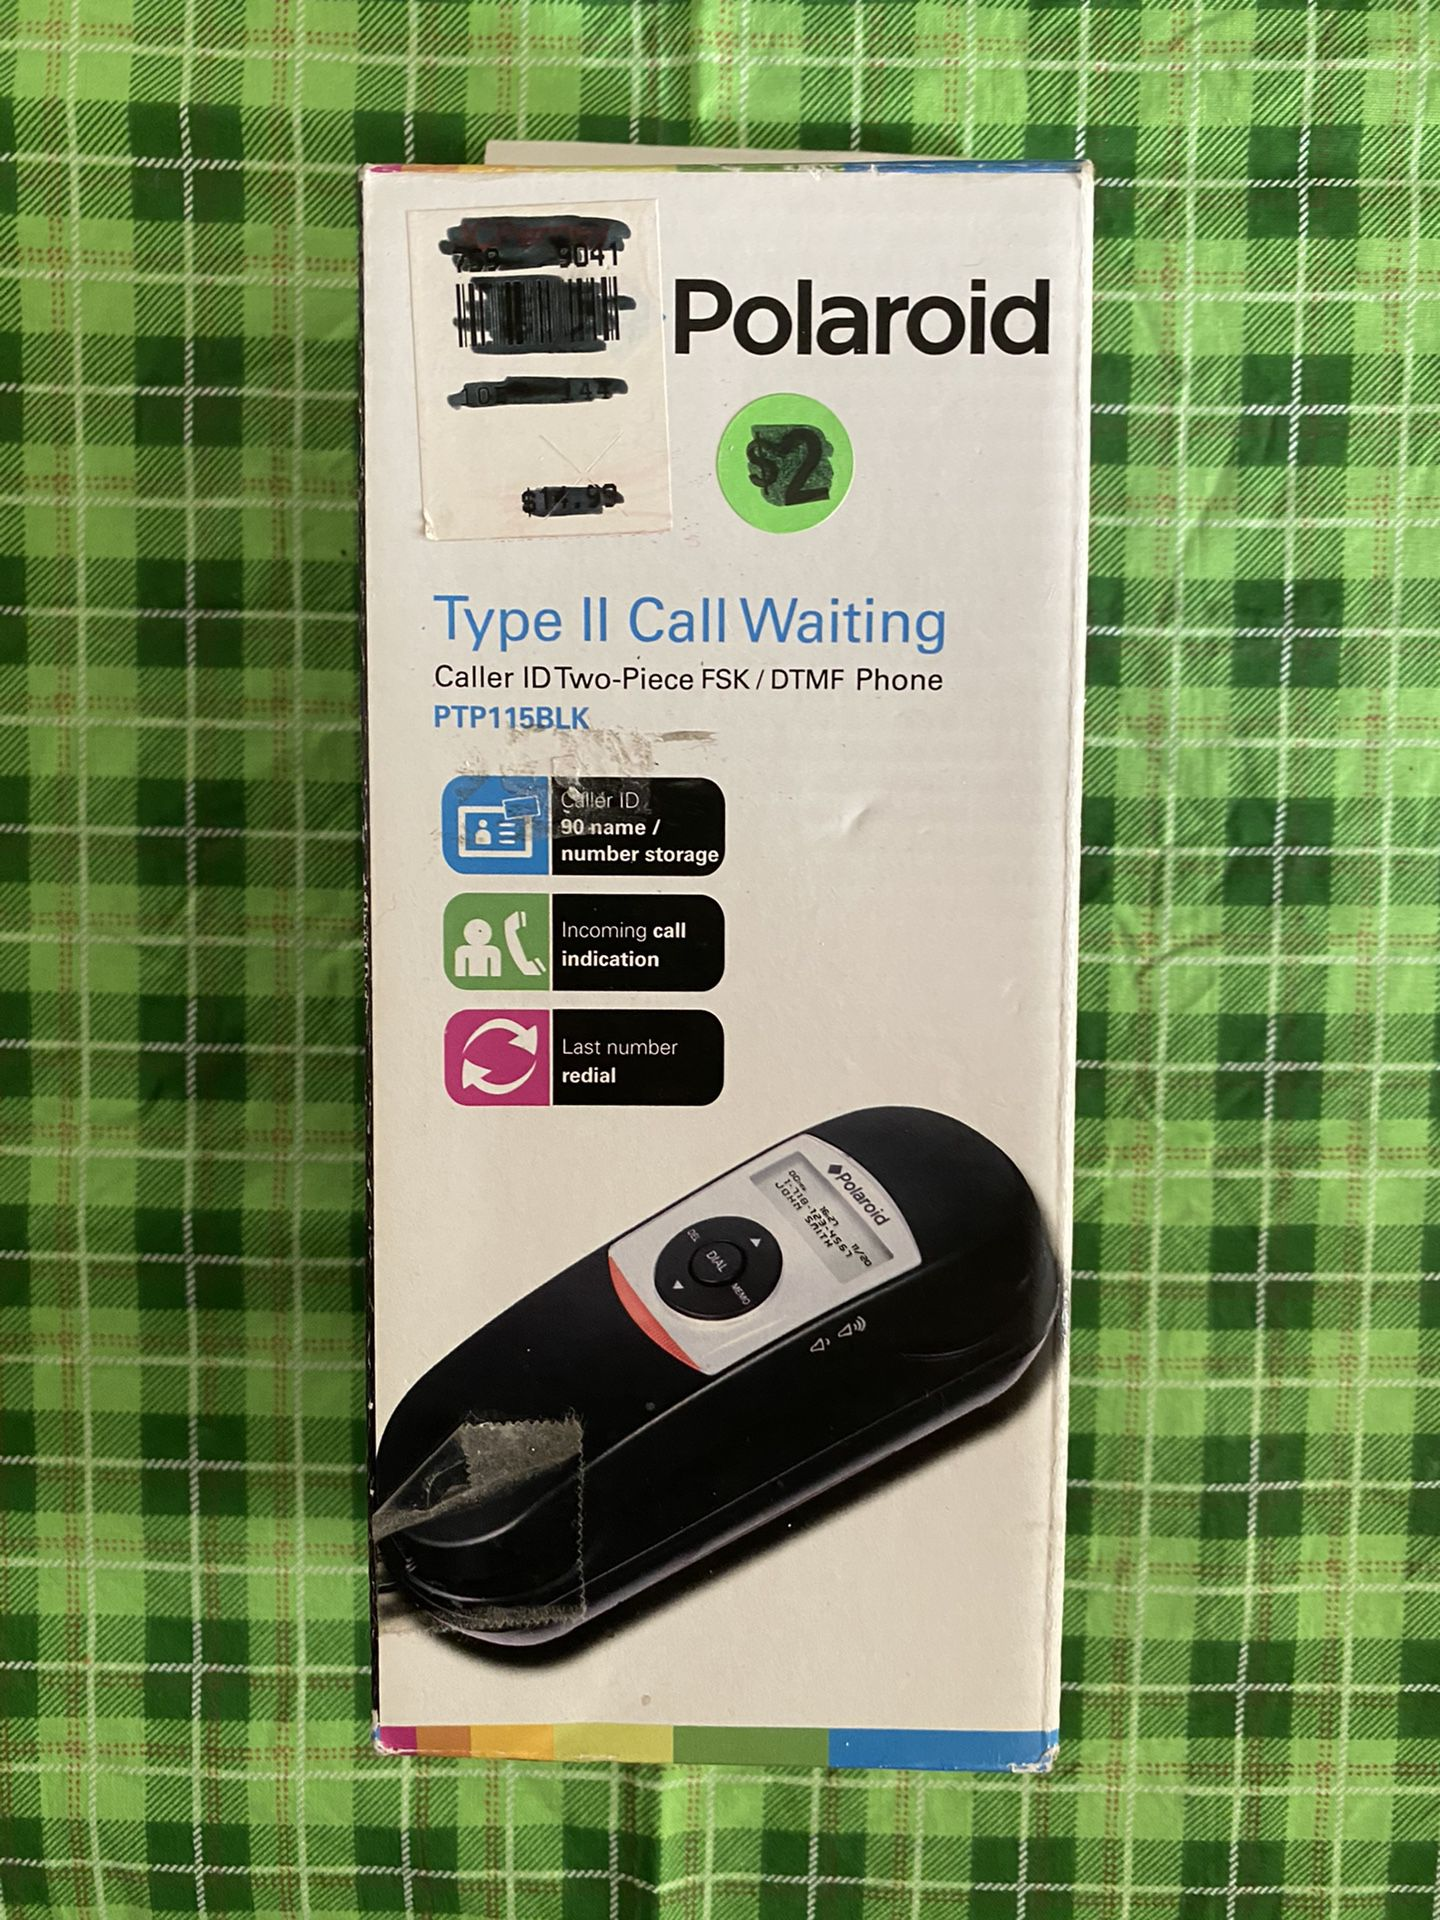 New Polaroid Type II Call Waiting